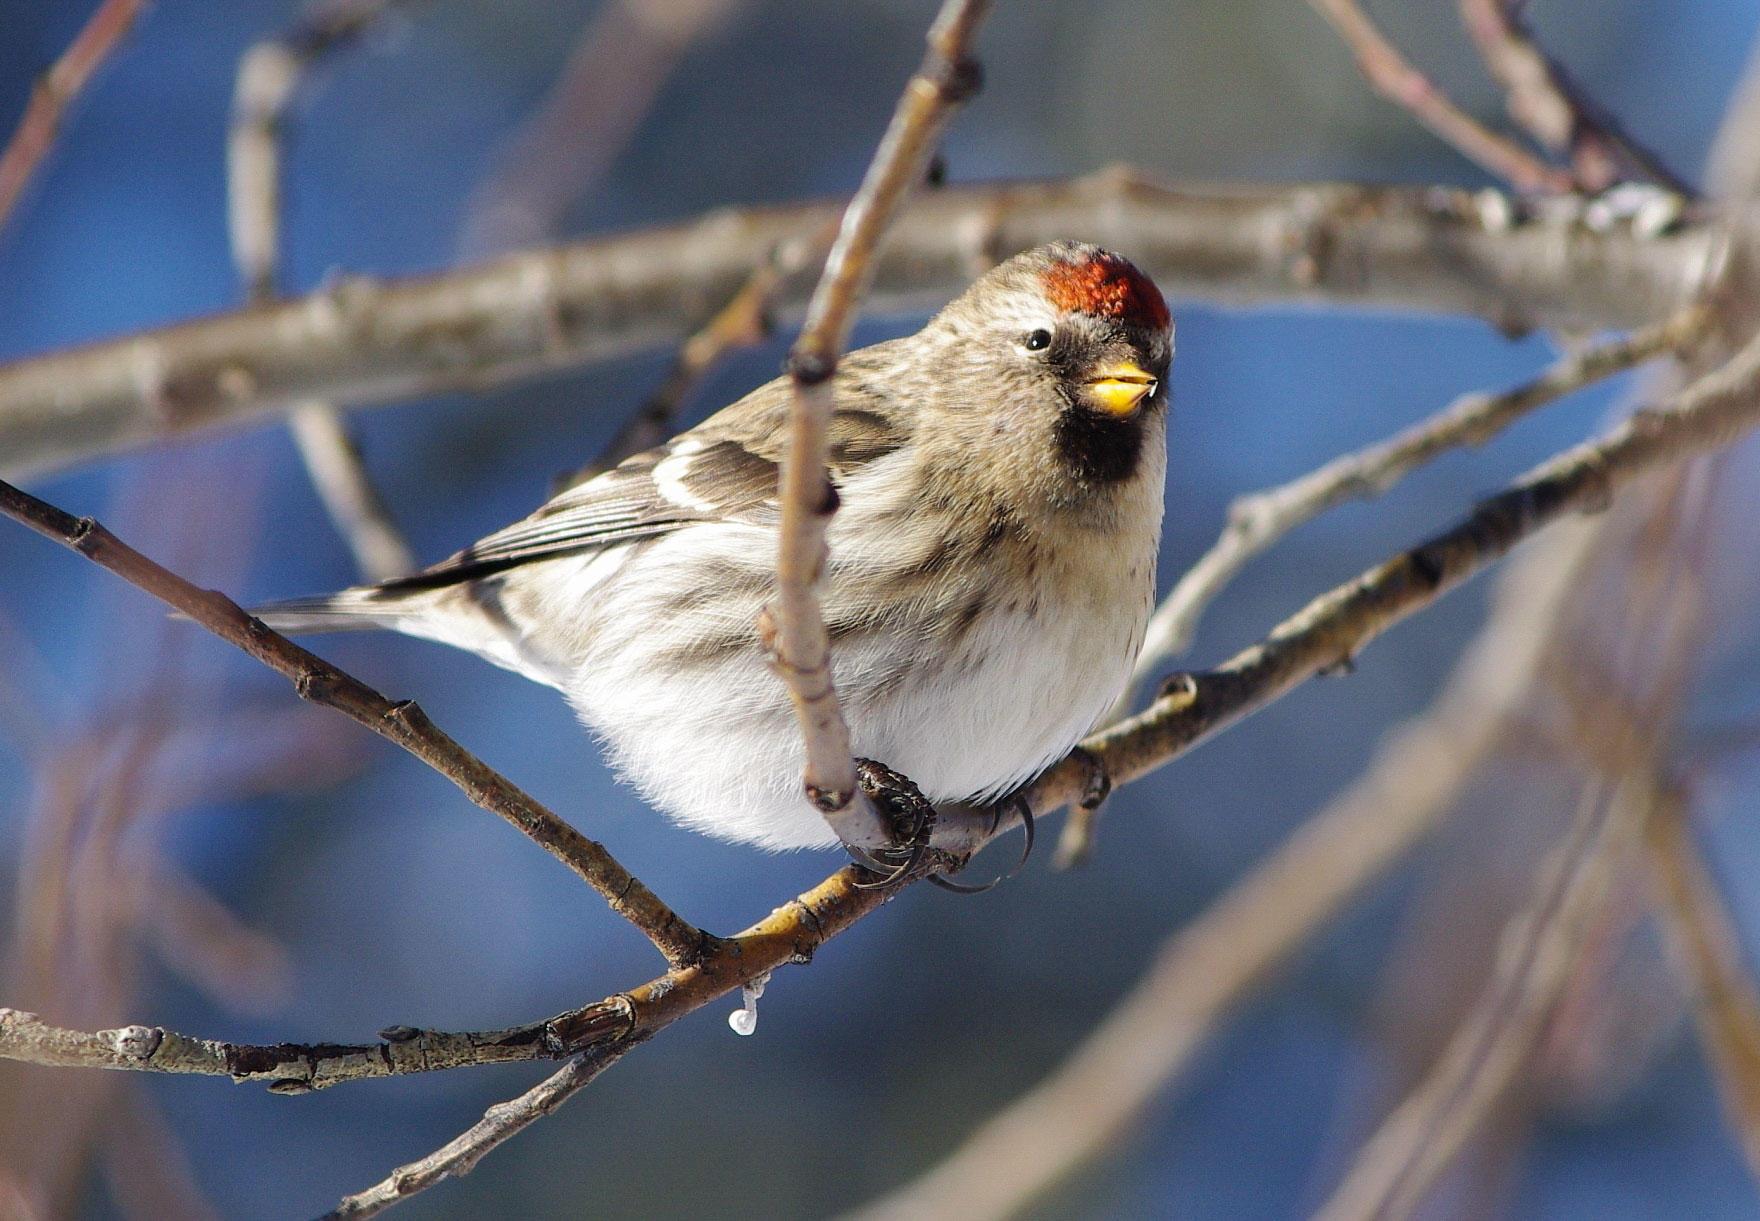 Common Redpoll. Susan Drury/Audubon Photography Awards